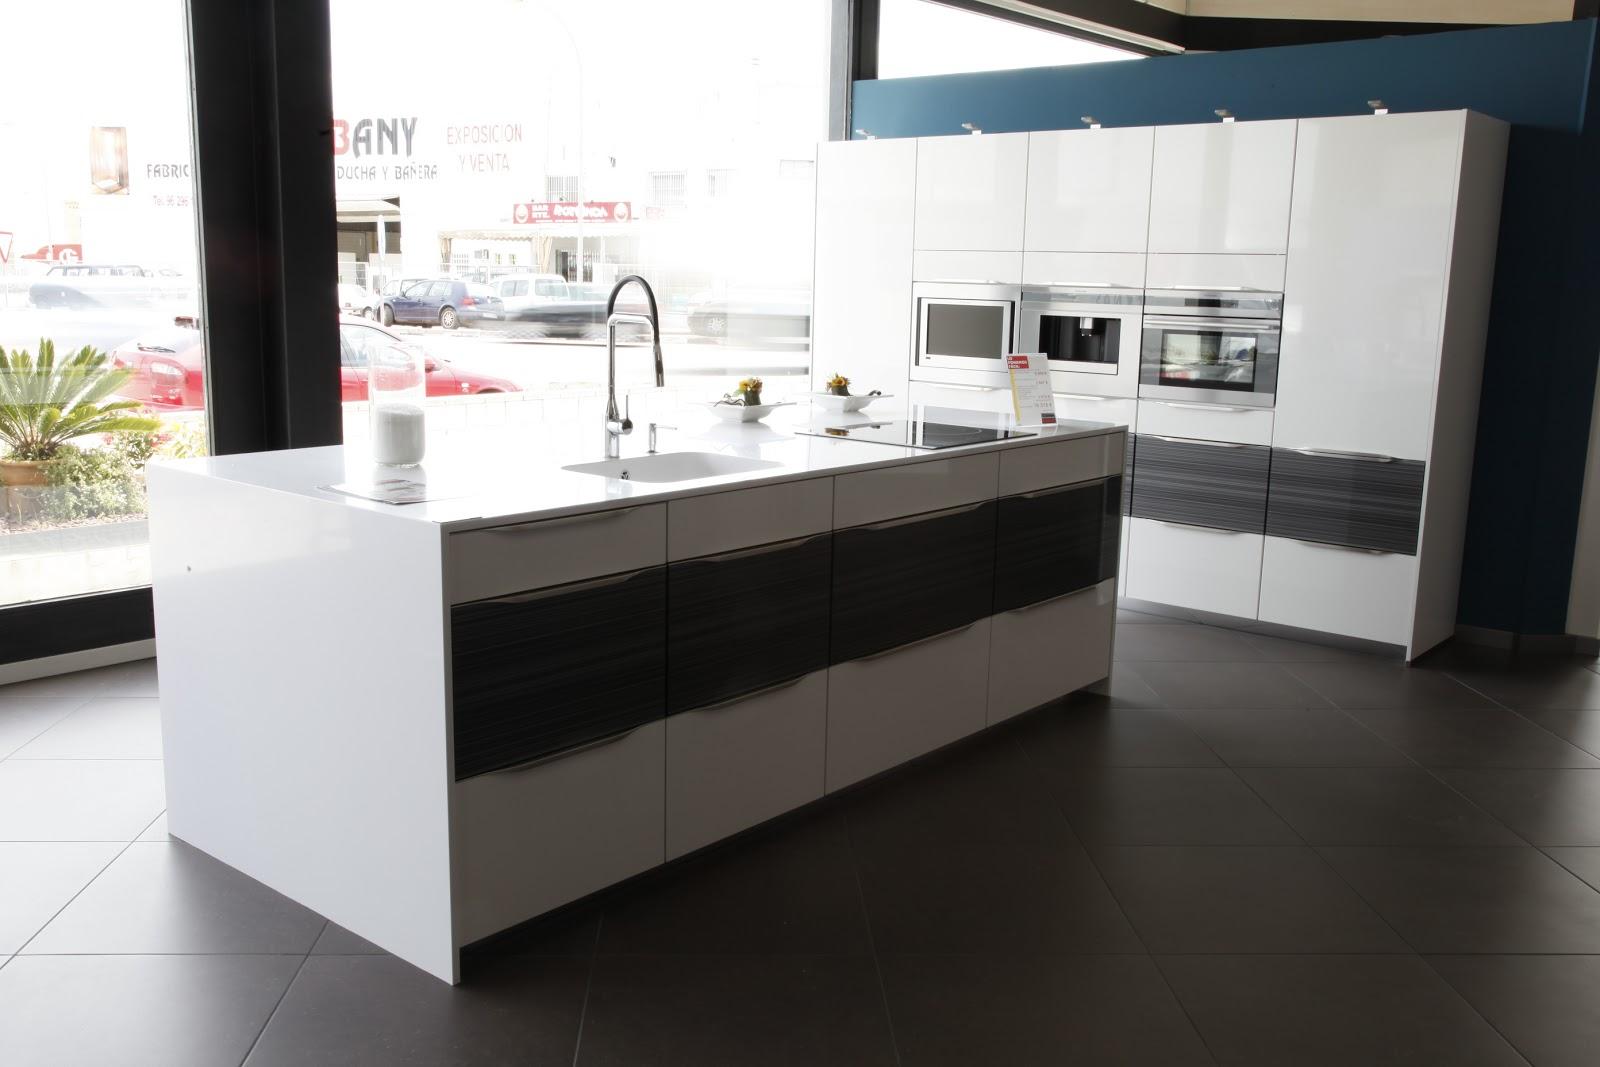 Muebles de cocina baratos en valencia beautiful muebles for Cocinas modernas valencia